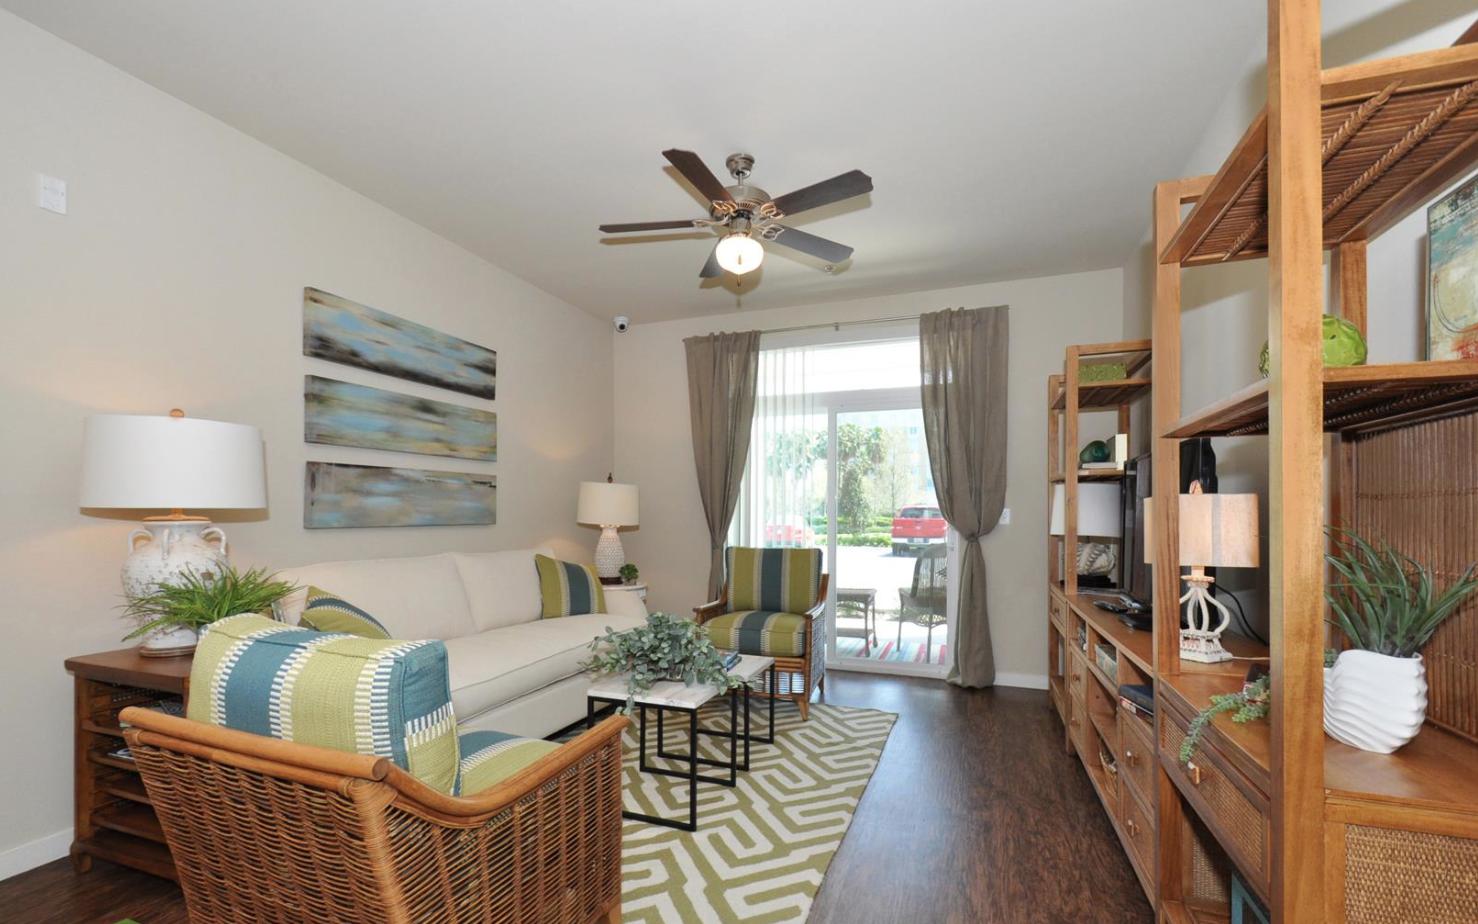 Sea Isle Resort Apartments In Orlando Fl Www Epochlivingseaisleresort Com Apartment Sea Isle 3 Bedroom Apartment